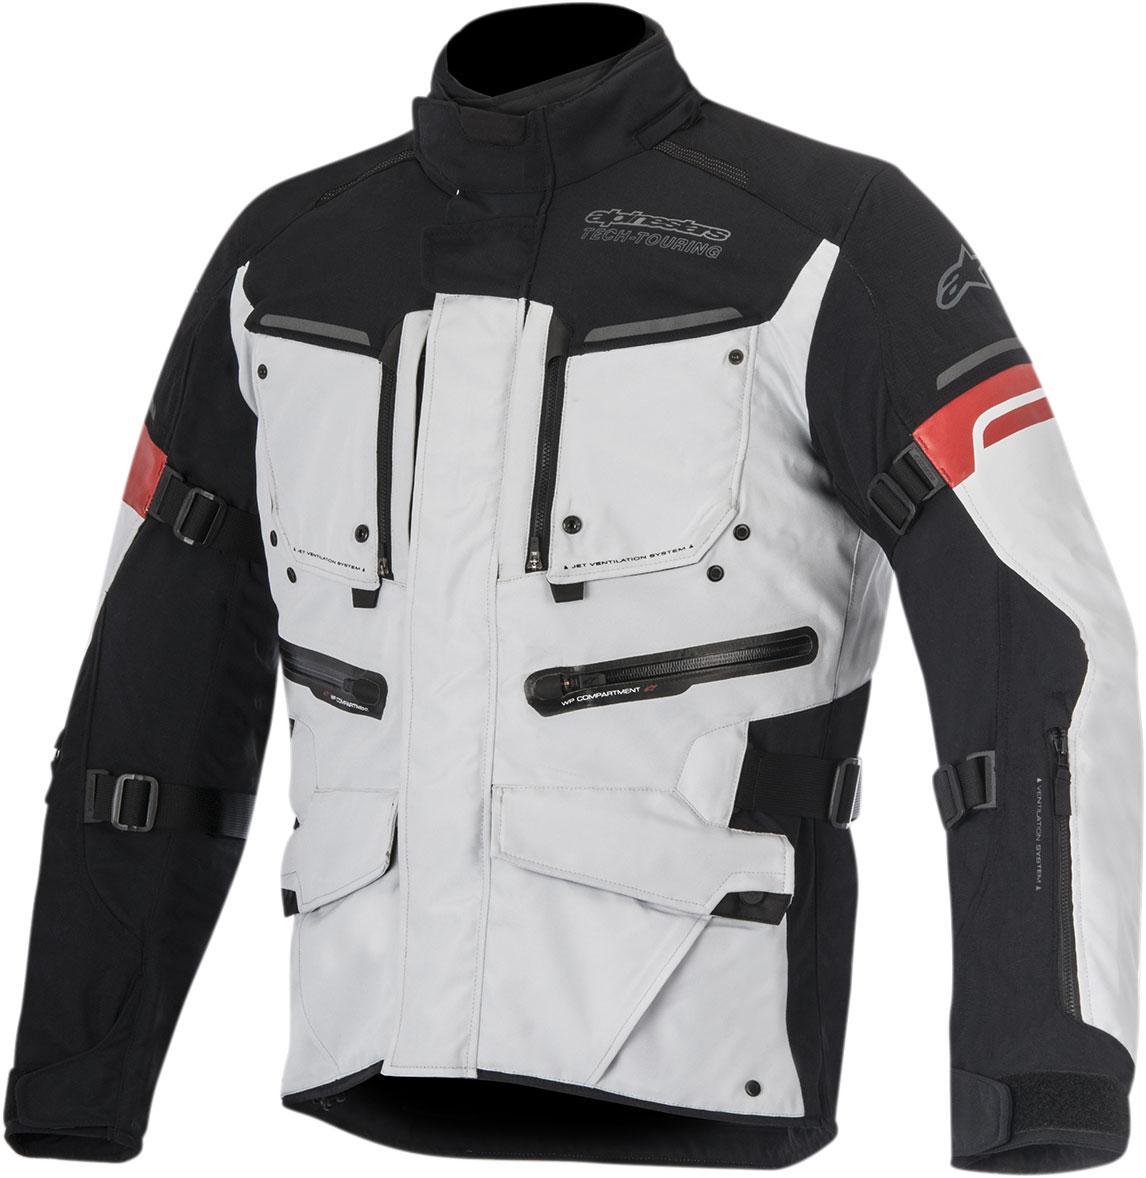 Alpinestars VALPARAISO 2 Drystar Adventure Touring Jacket (Light Gray/Black)